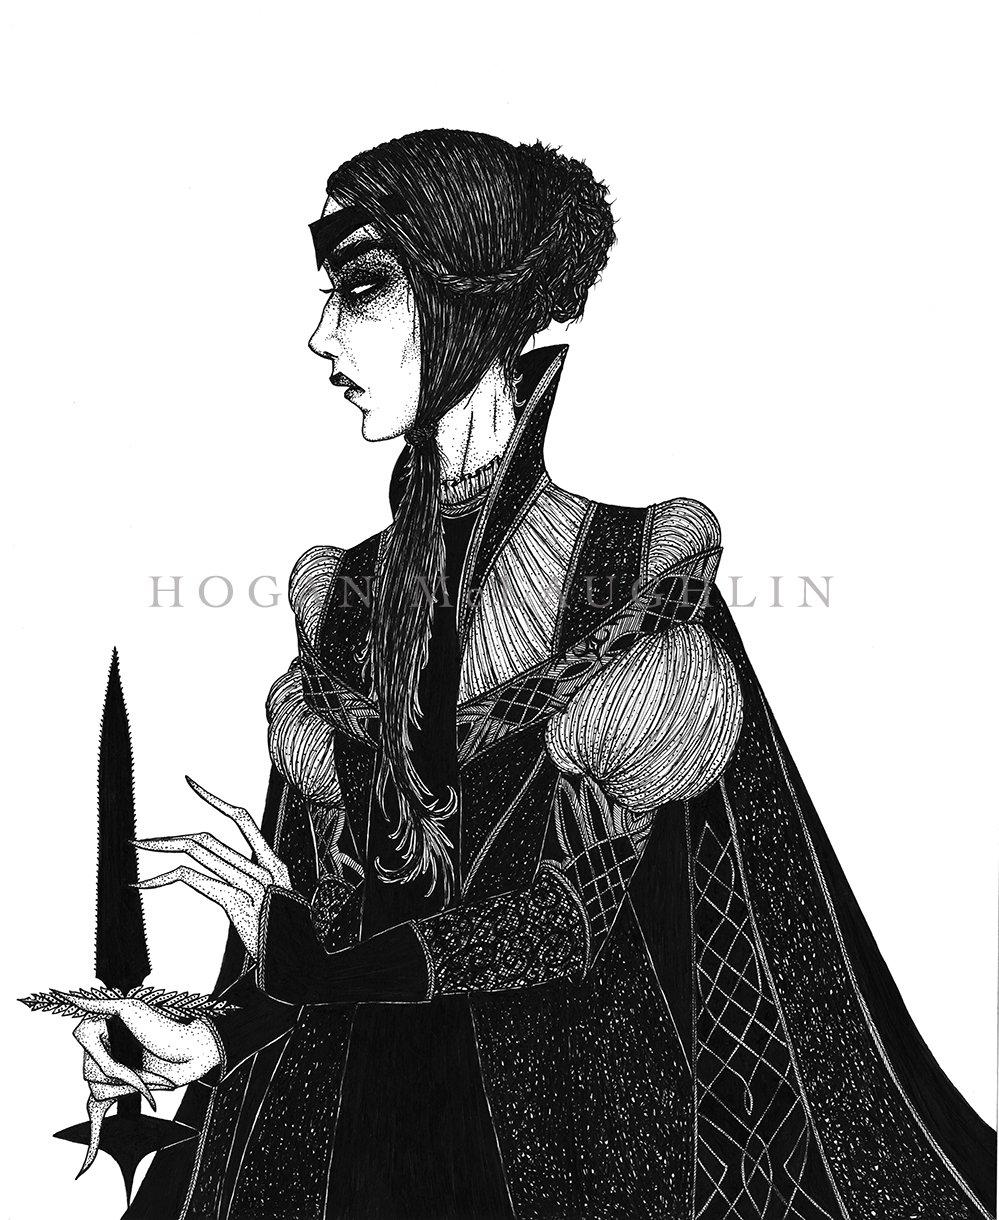 Image of Lady Macbeth: Direst Cruelty